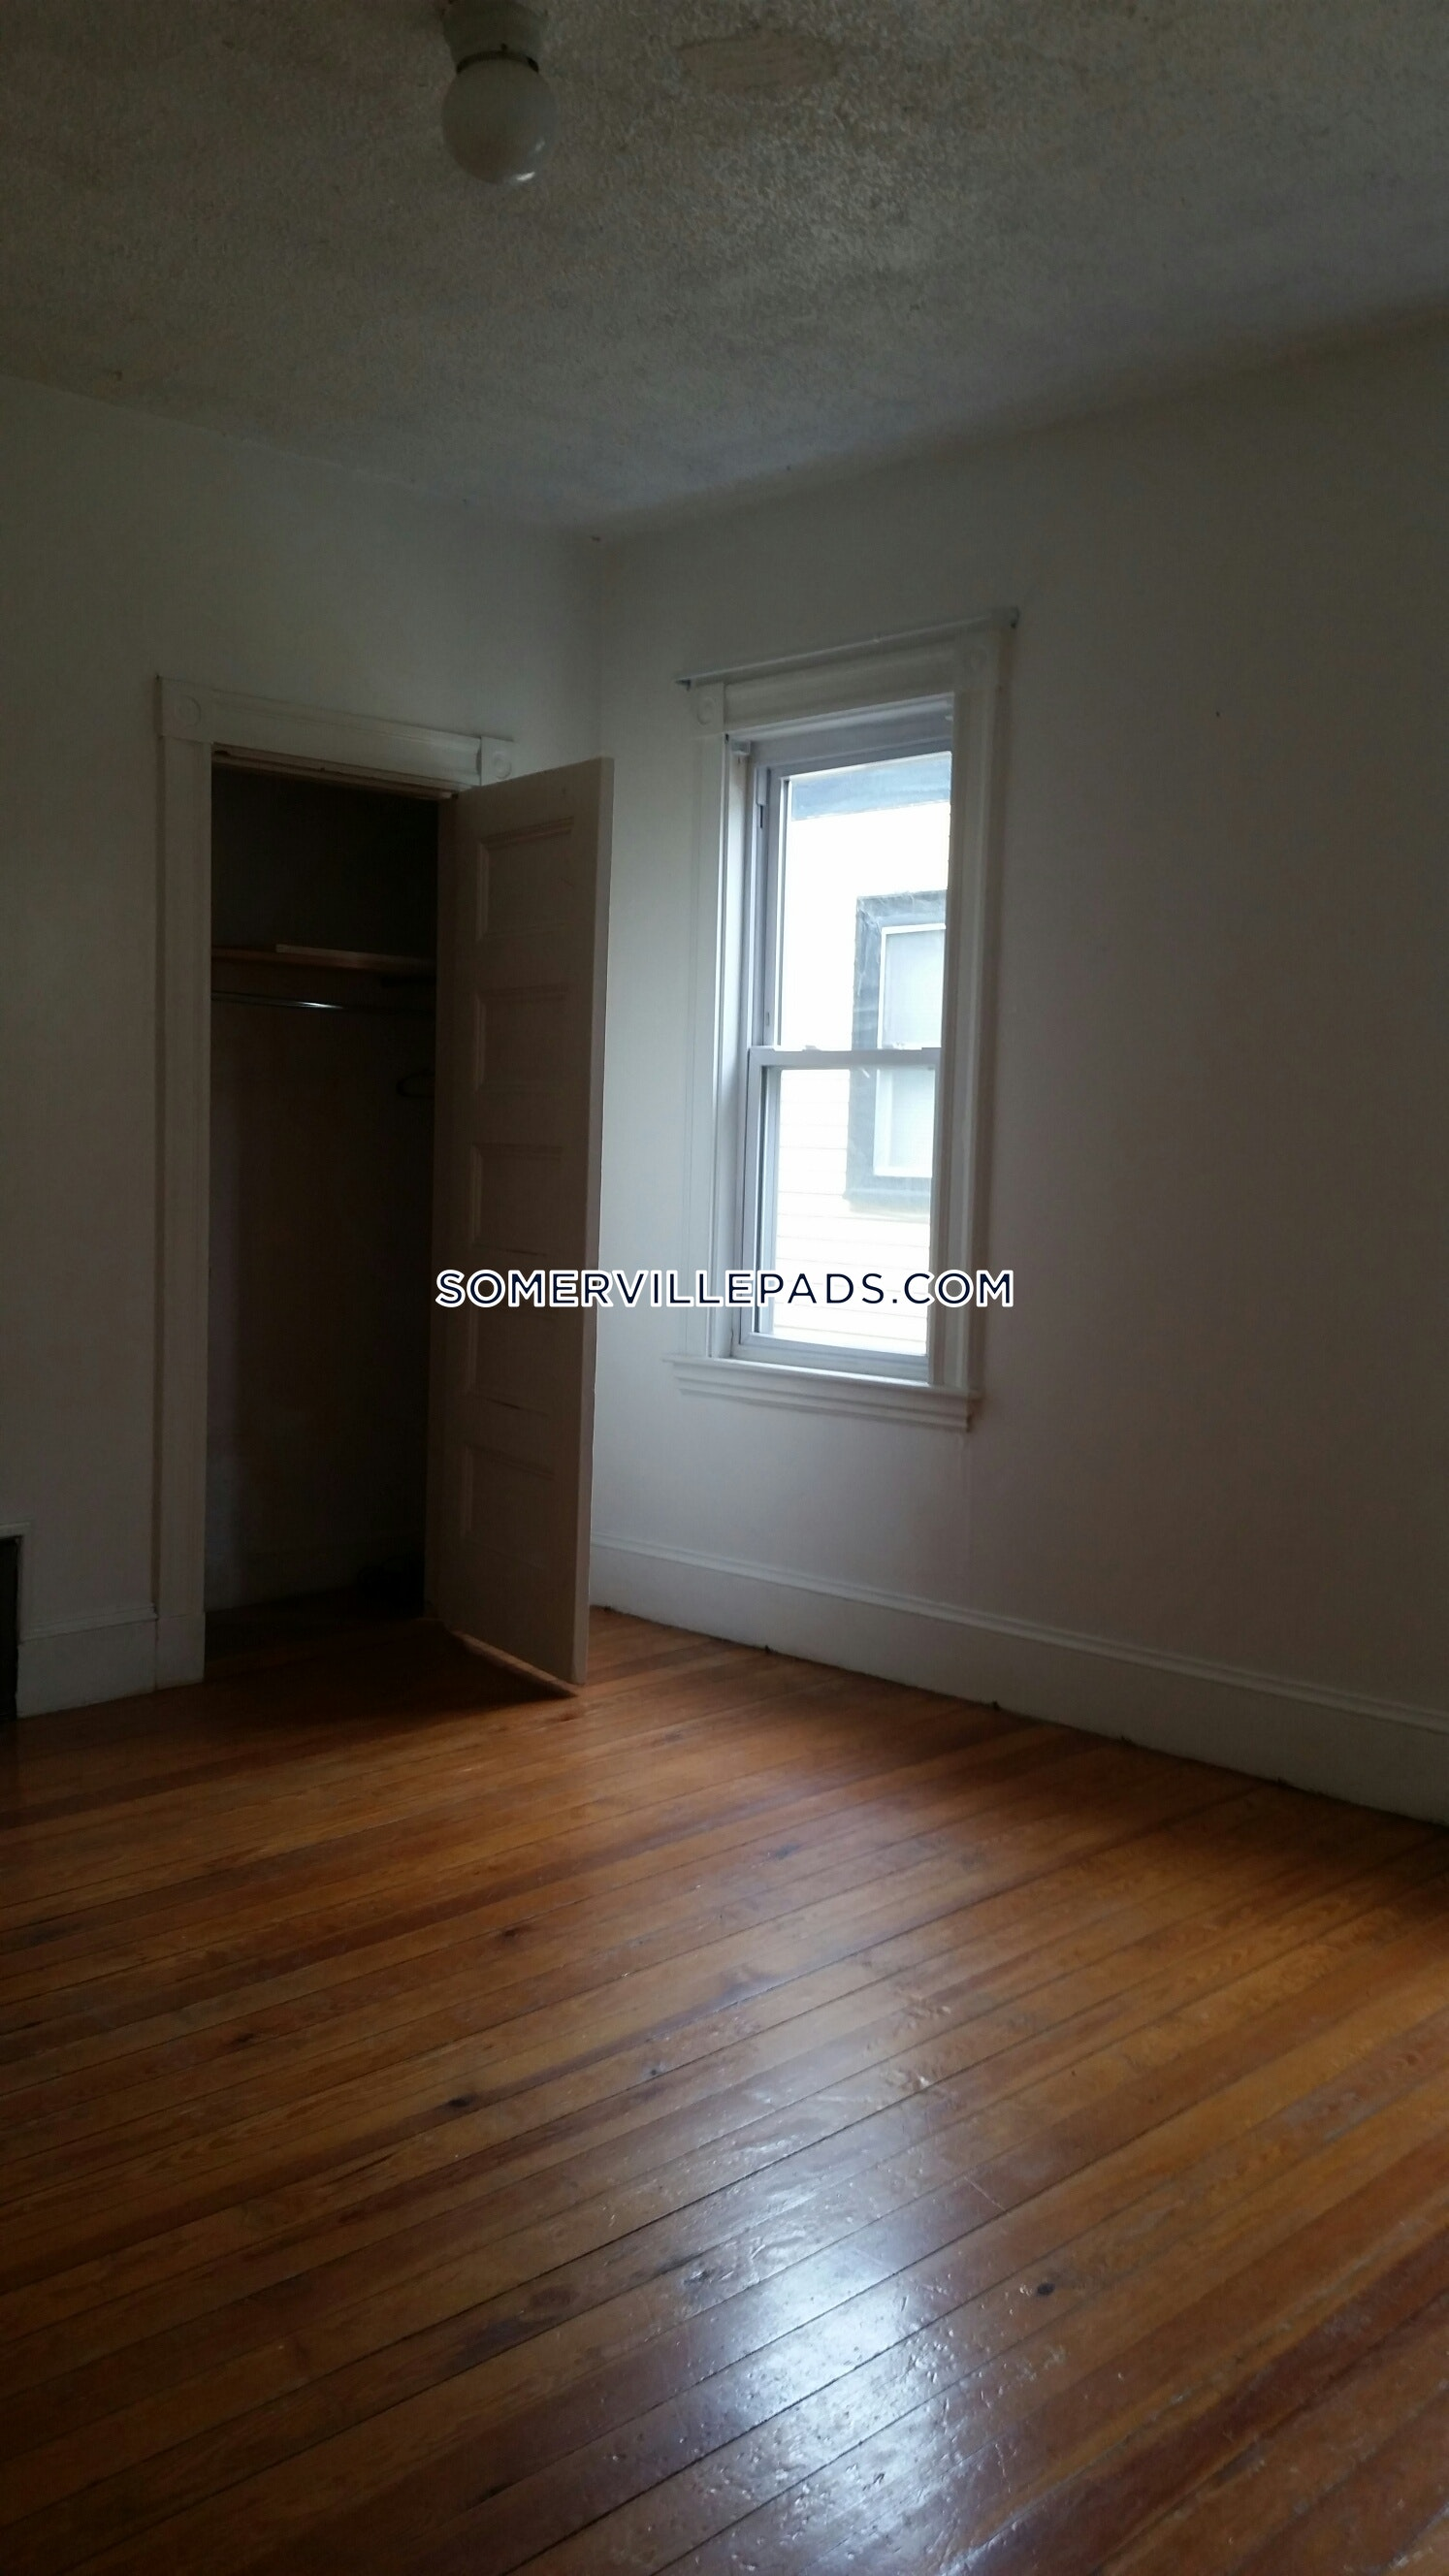 4-beds-2-baths-somerville-spring-hill-3300-397867